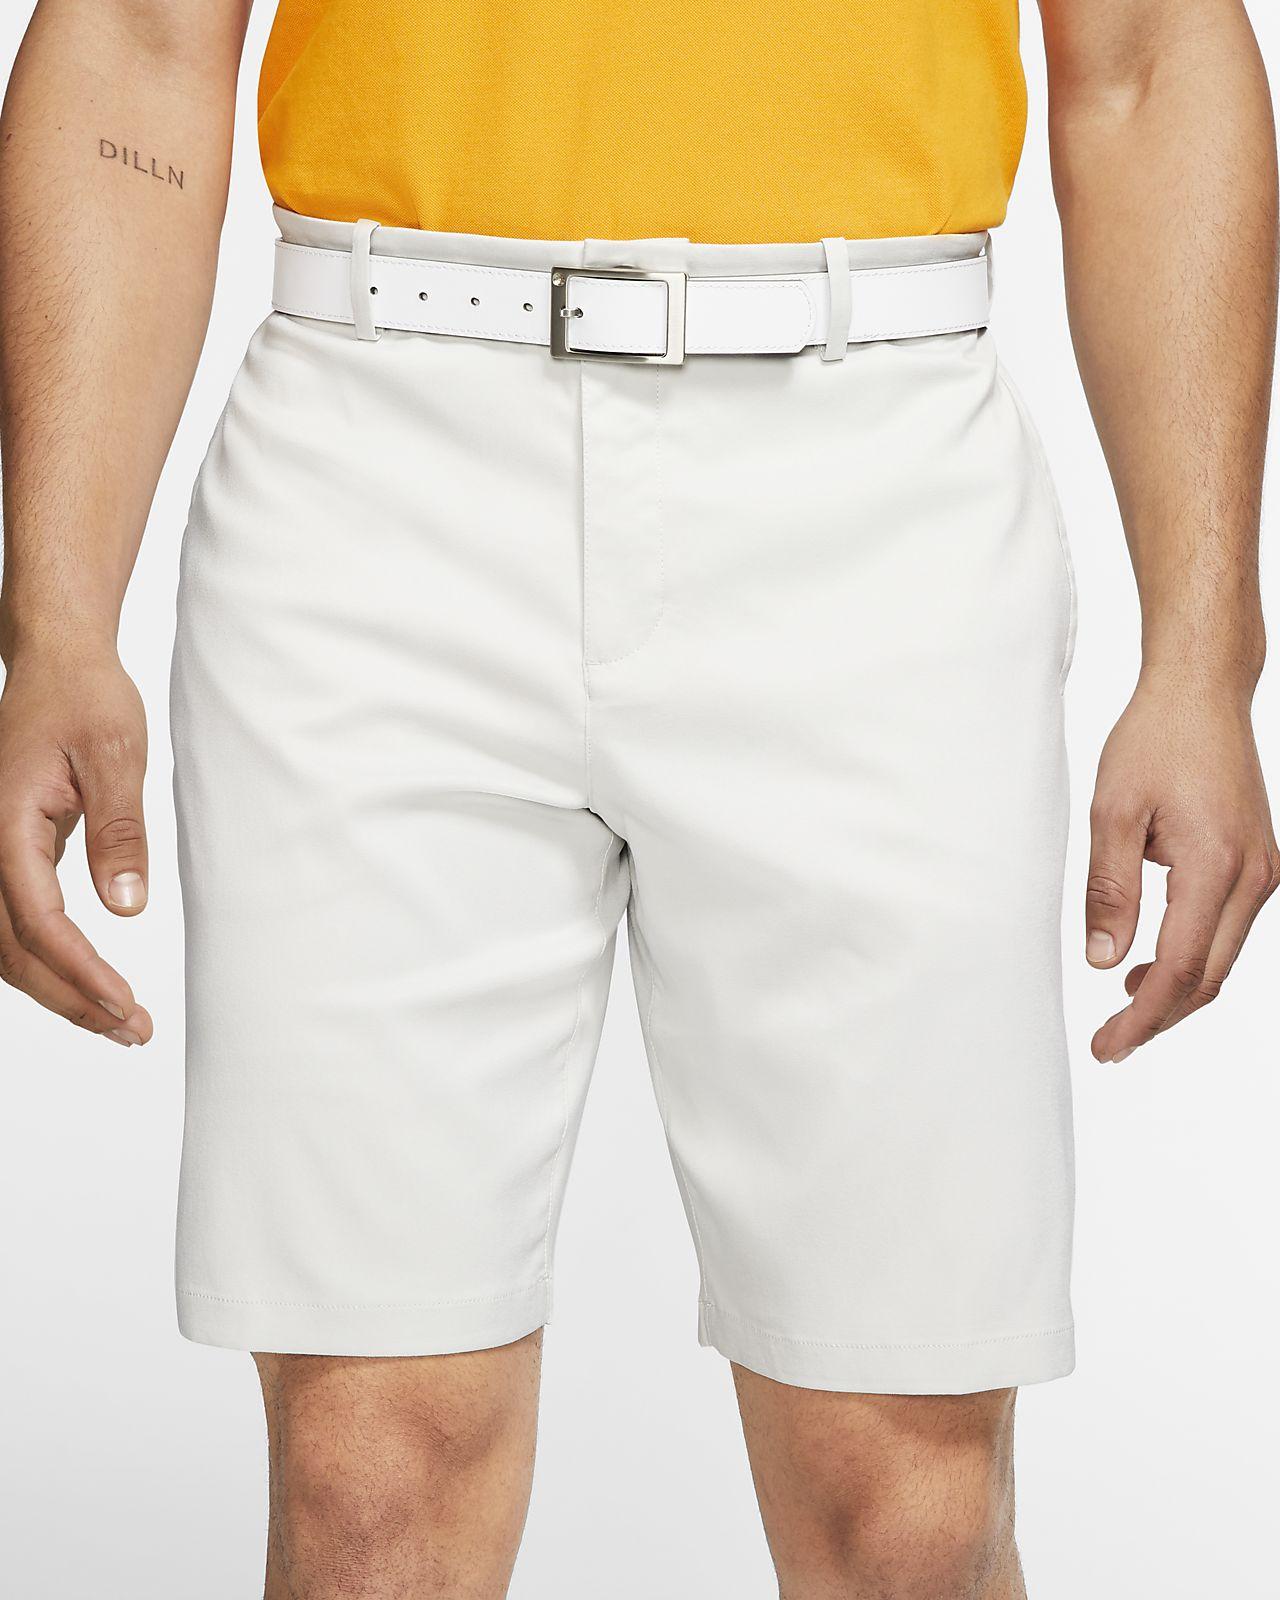 Nike Flex Herren-Golfshorts